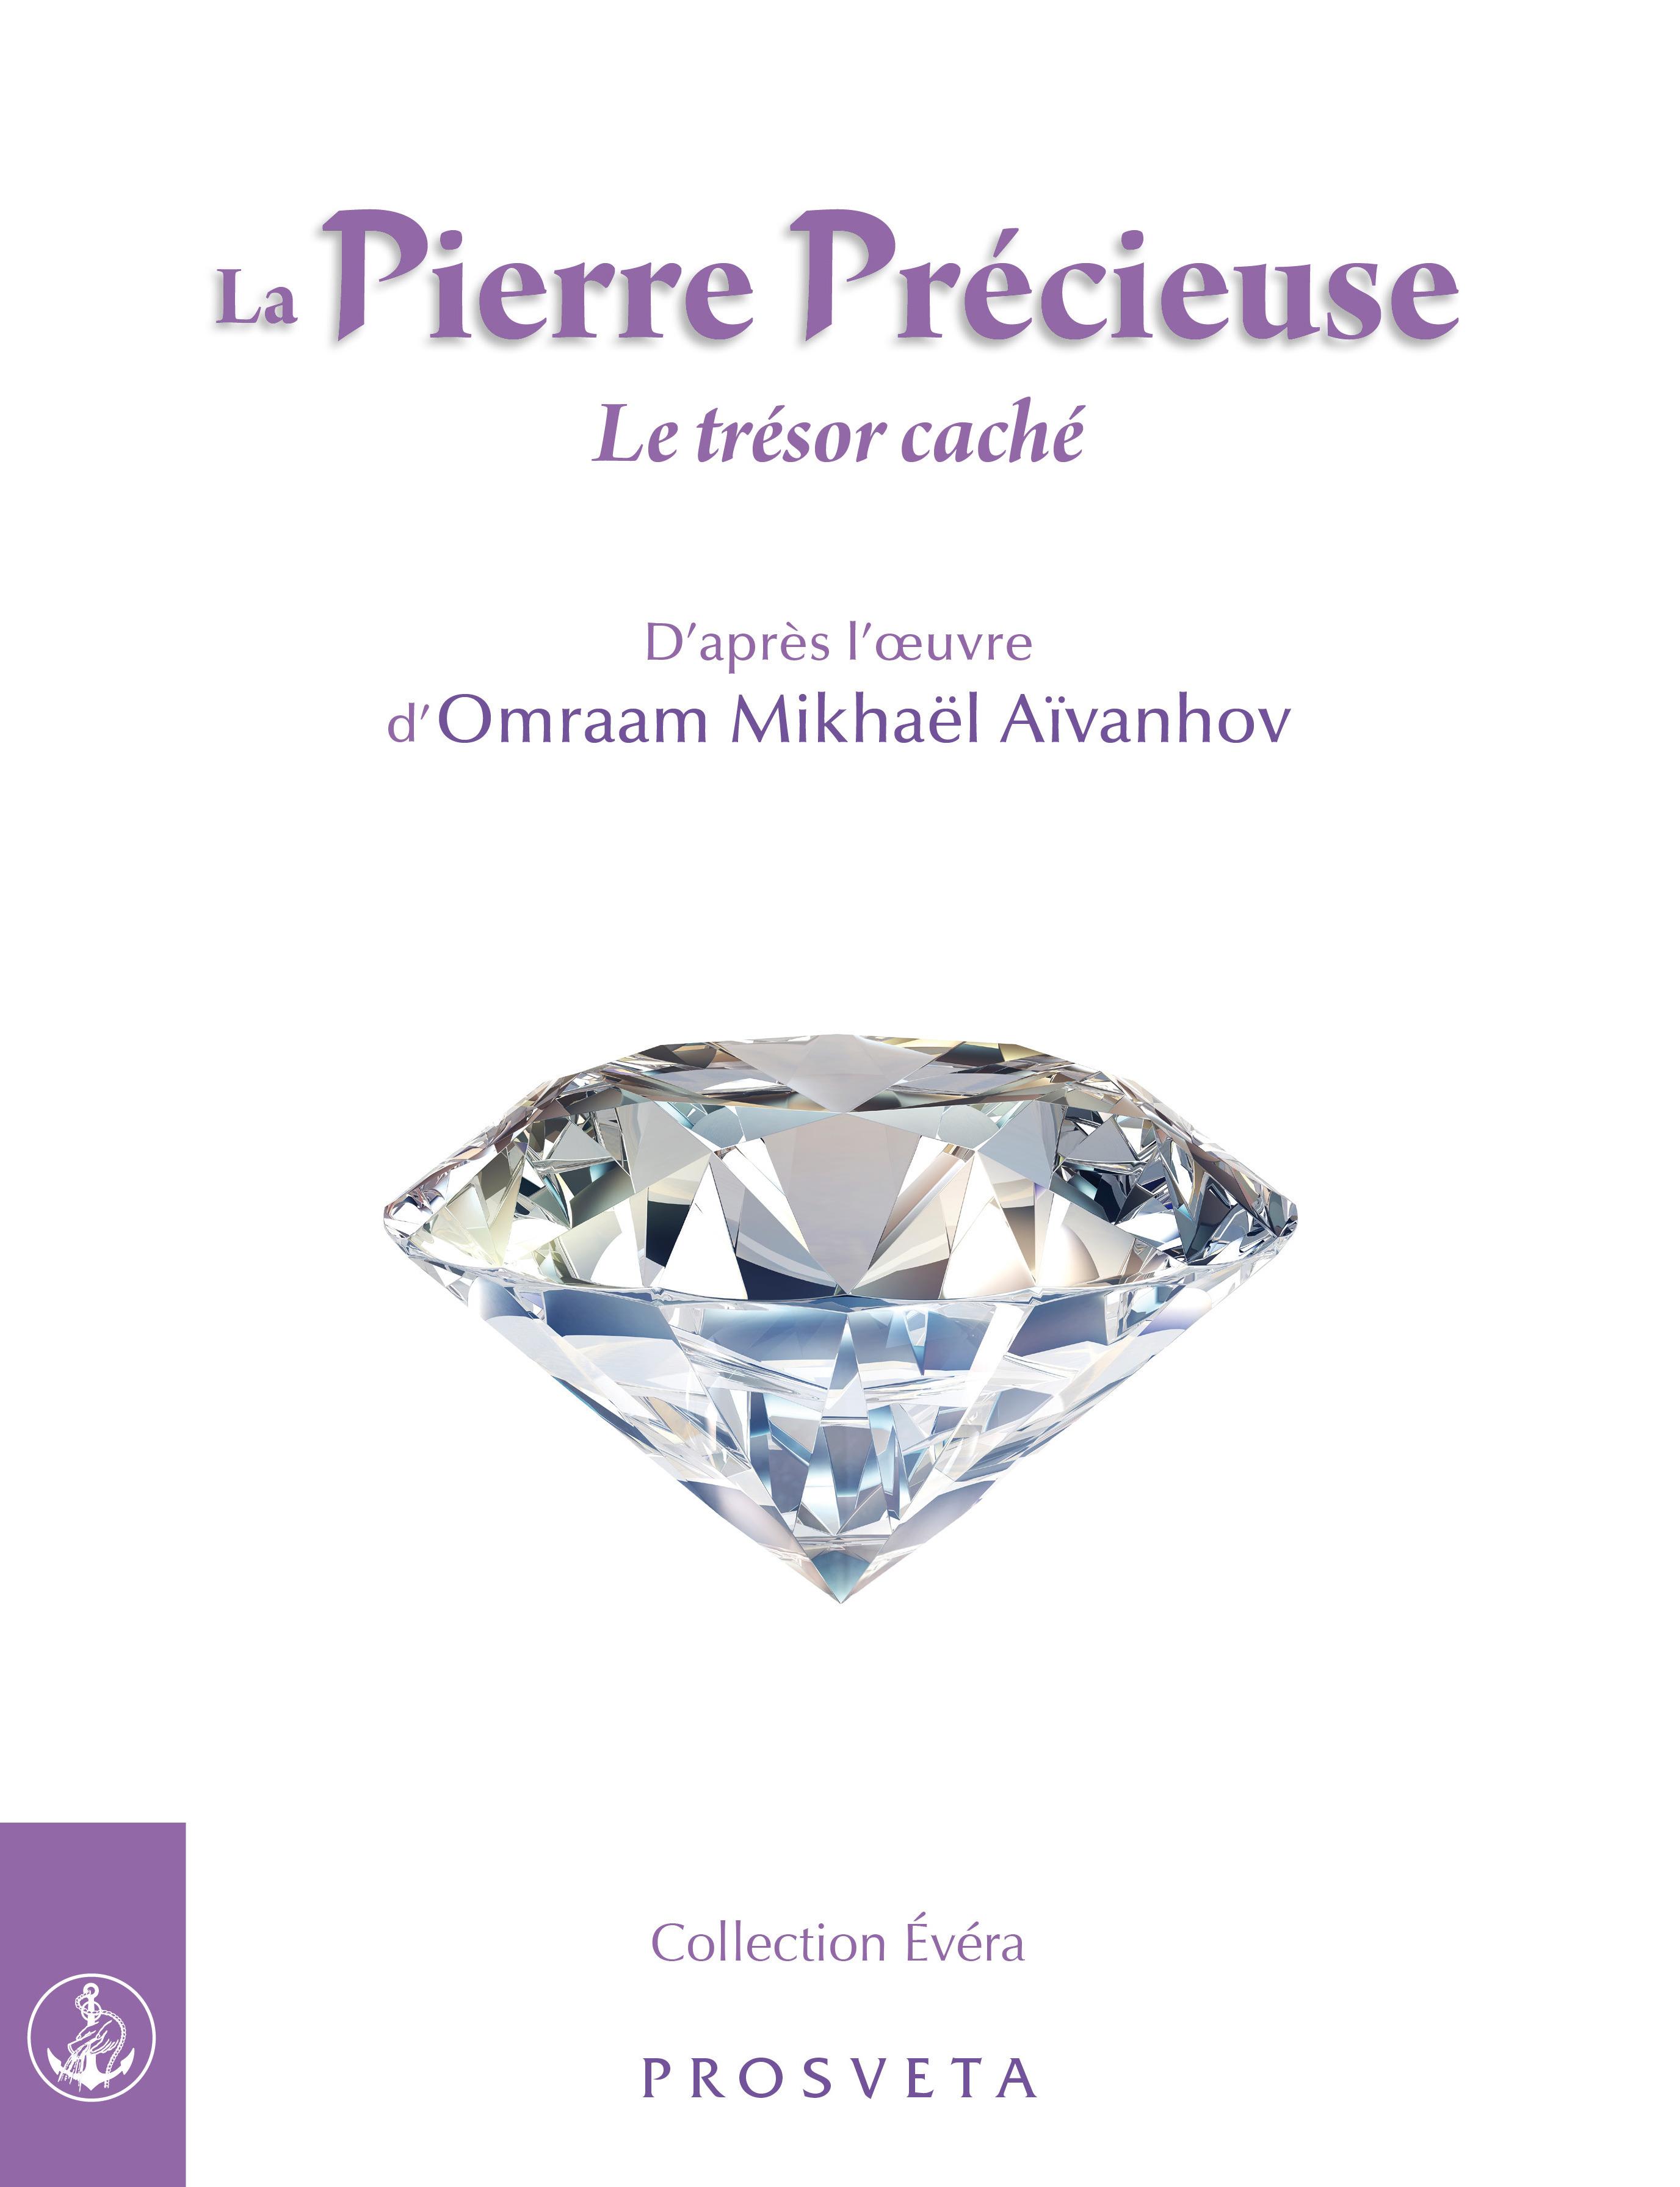 La Pierre Précieuse  - Mikhael Aivanhov O.  - Omraam Mikhaël Aïvanhov (D'Après)